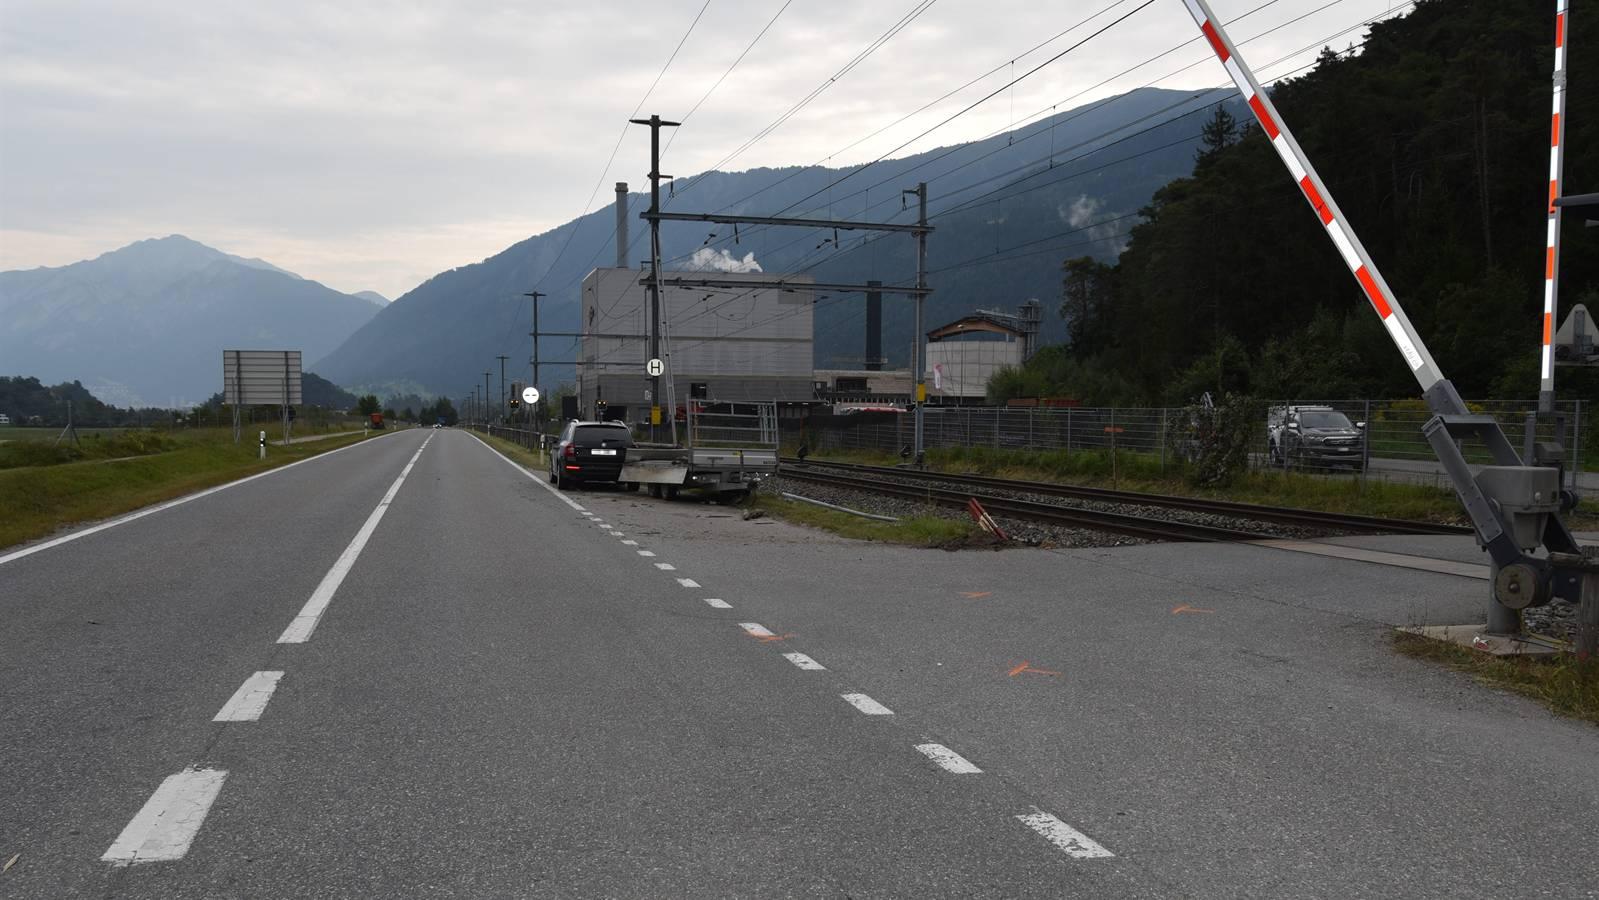 2021-09-10 Domat Ems Bahnübergang__w_1600__h_0